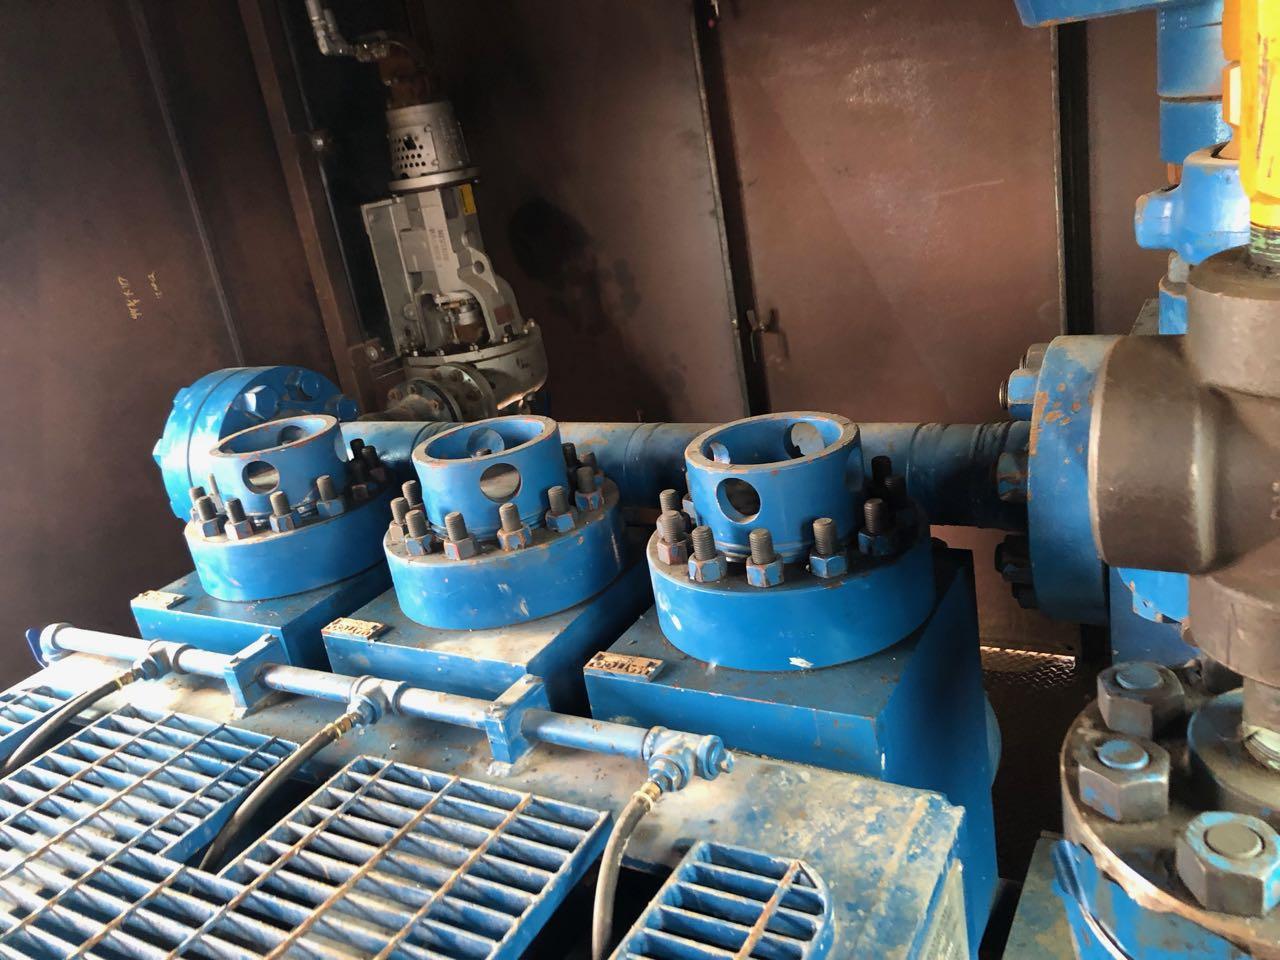 Two (2) Used Ellis William Engineering Co. Model E-1000, 1000 Hp Triplex Mud Pumps With Cat 3508 Diesel